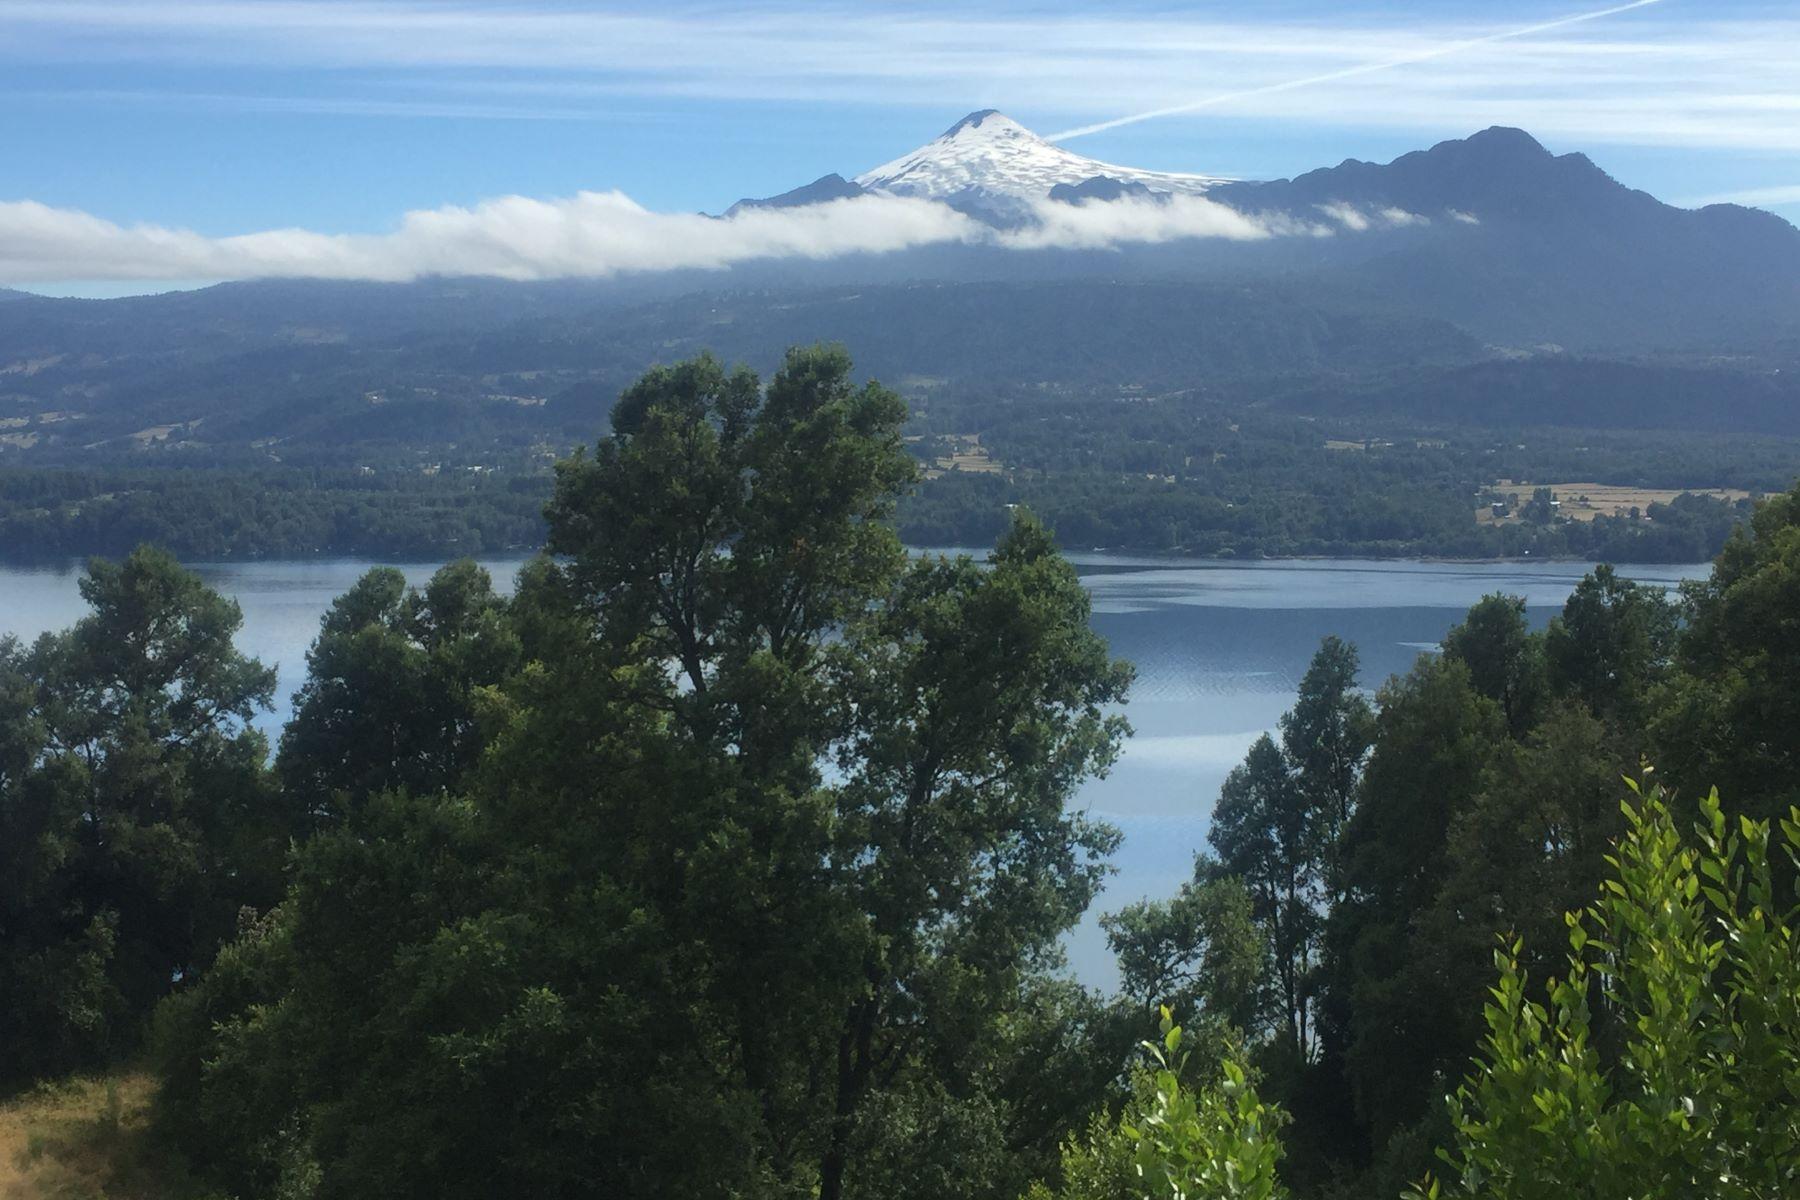 Land for Sale at Spectacular Land in Private Condo in Calafquen Lake Panguipulli, Valdivia, Los Rios Chile